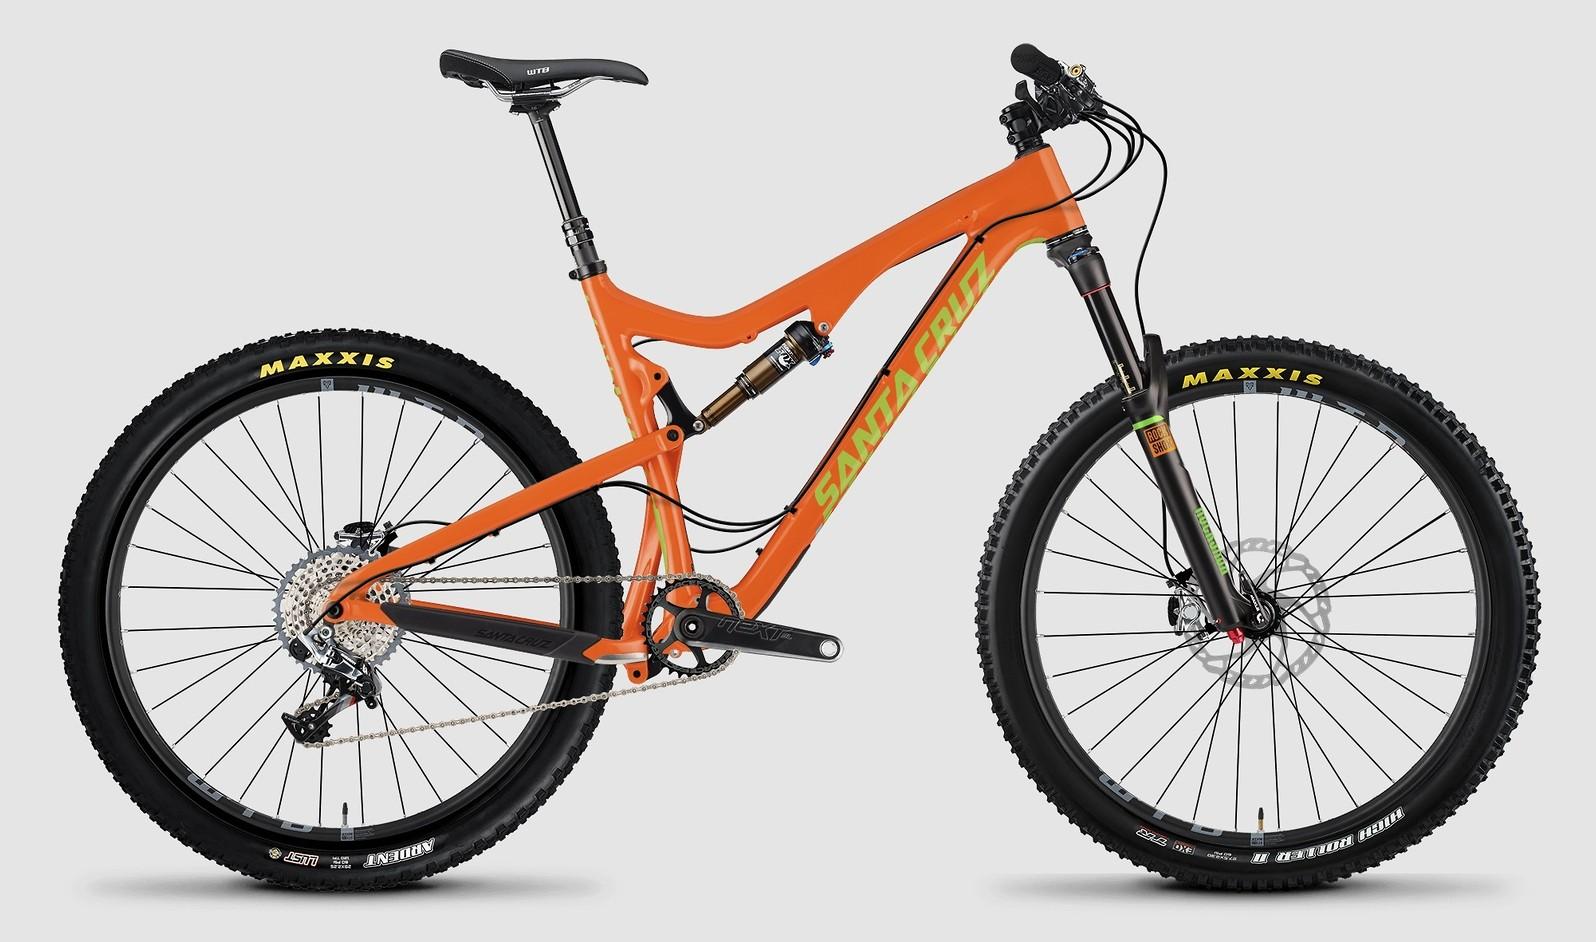 2015 Santa Cruz 5010 Carbon XX1 bike